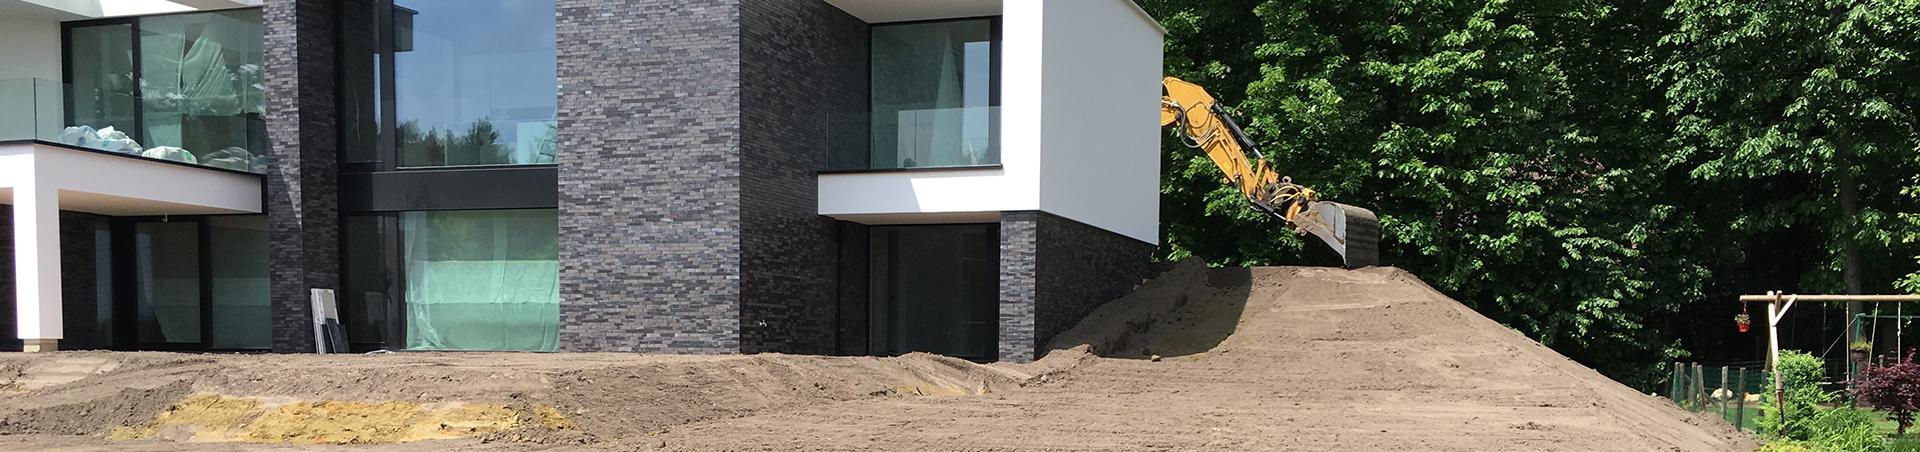 homeslide1